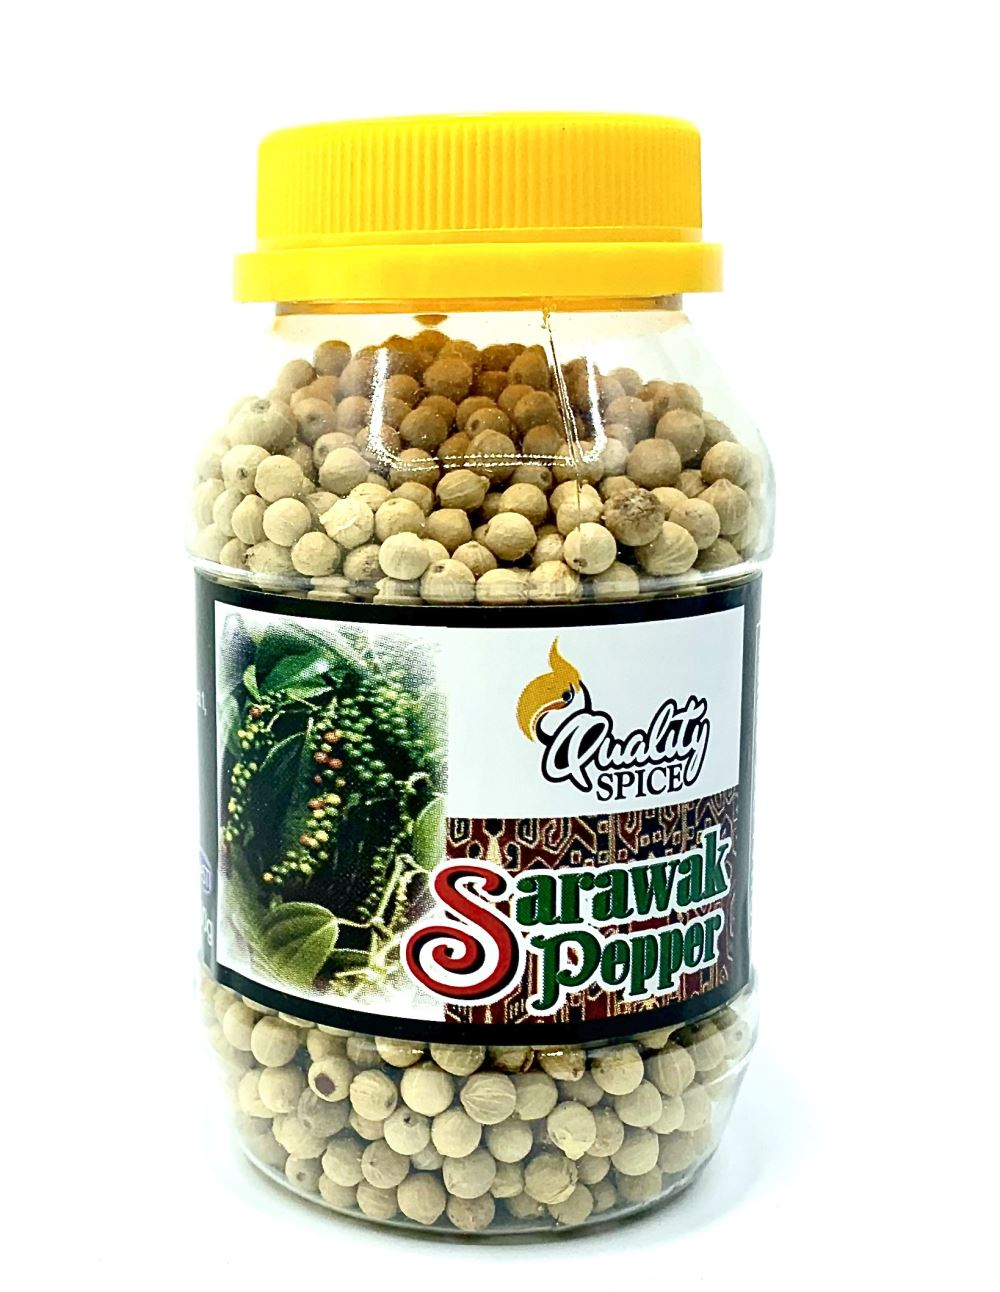 Sarawak White Pepper Berries 100G Premium Bottle